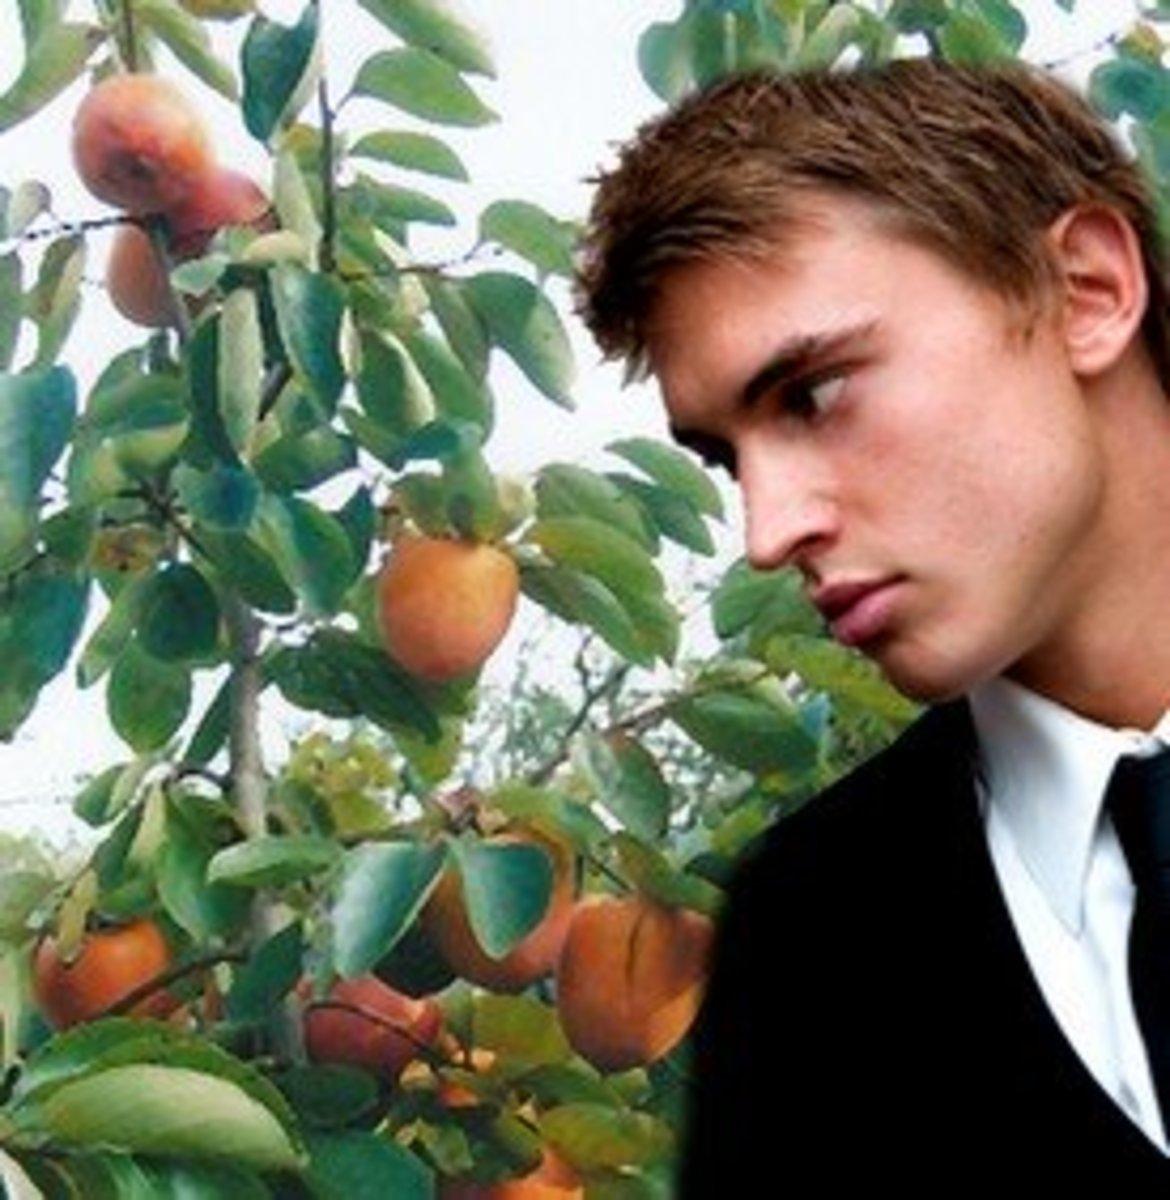 I don't trust those fruits!